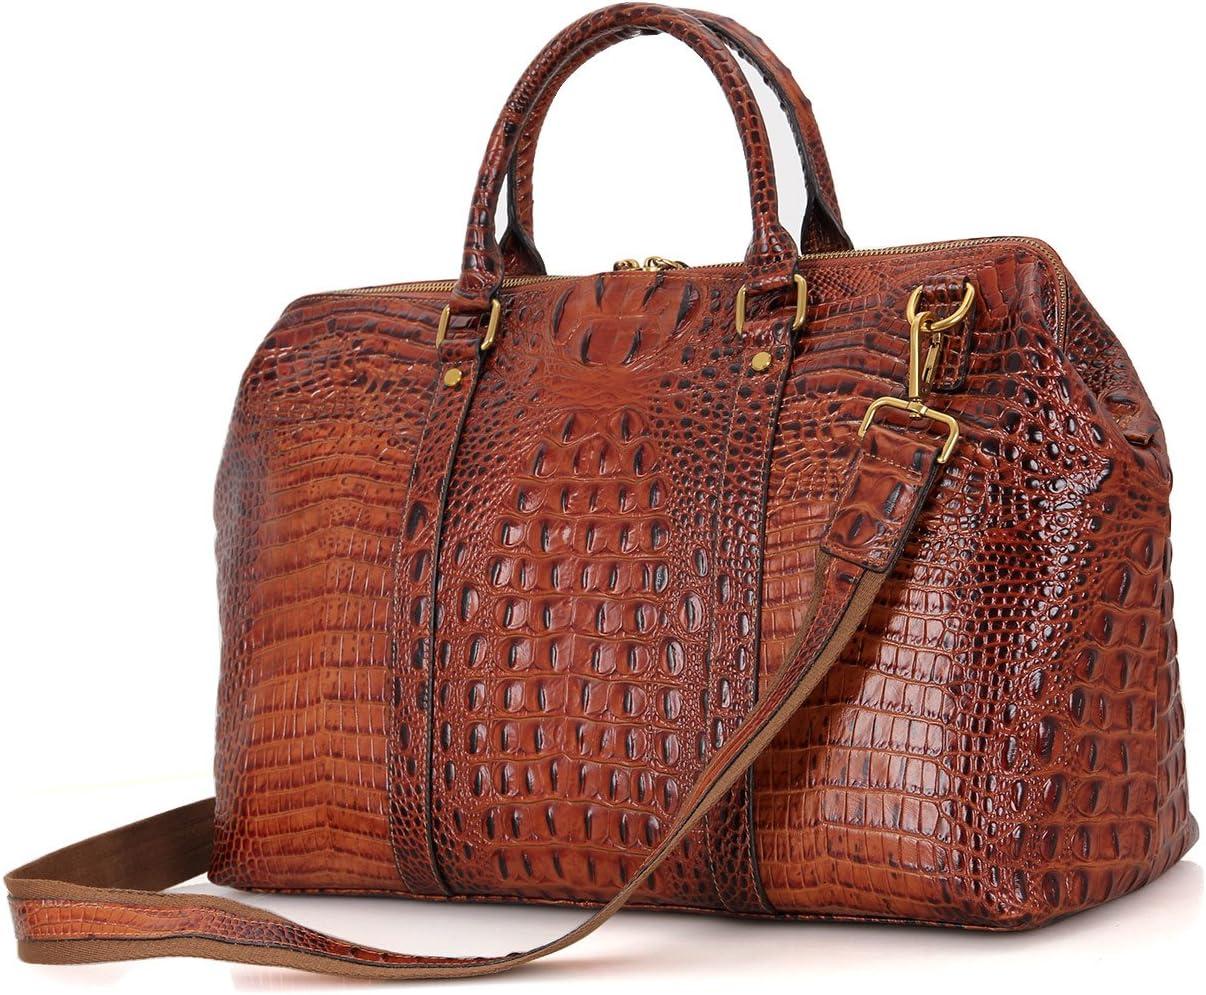 Genda 2Archer Crocodile Embossed Leather Overnight Travel Duffle Weekend Bag